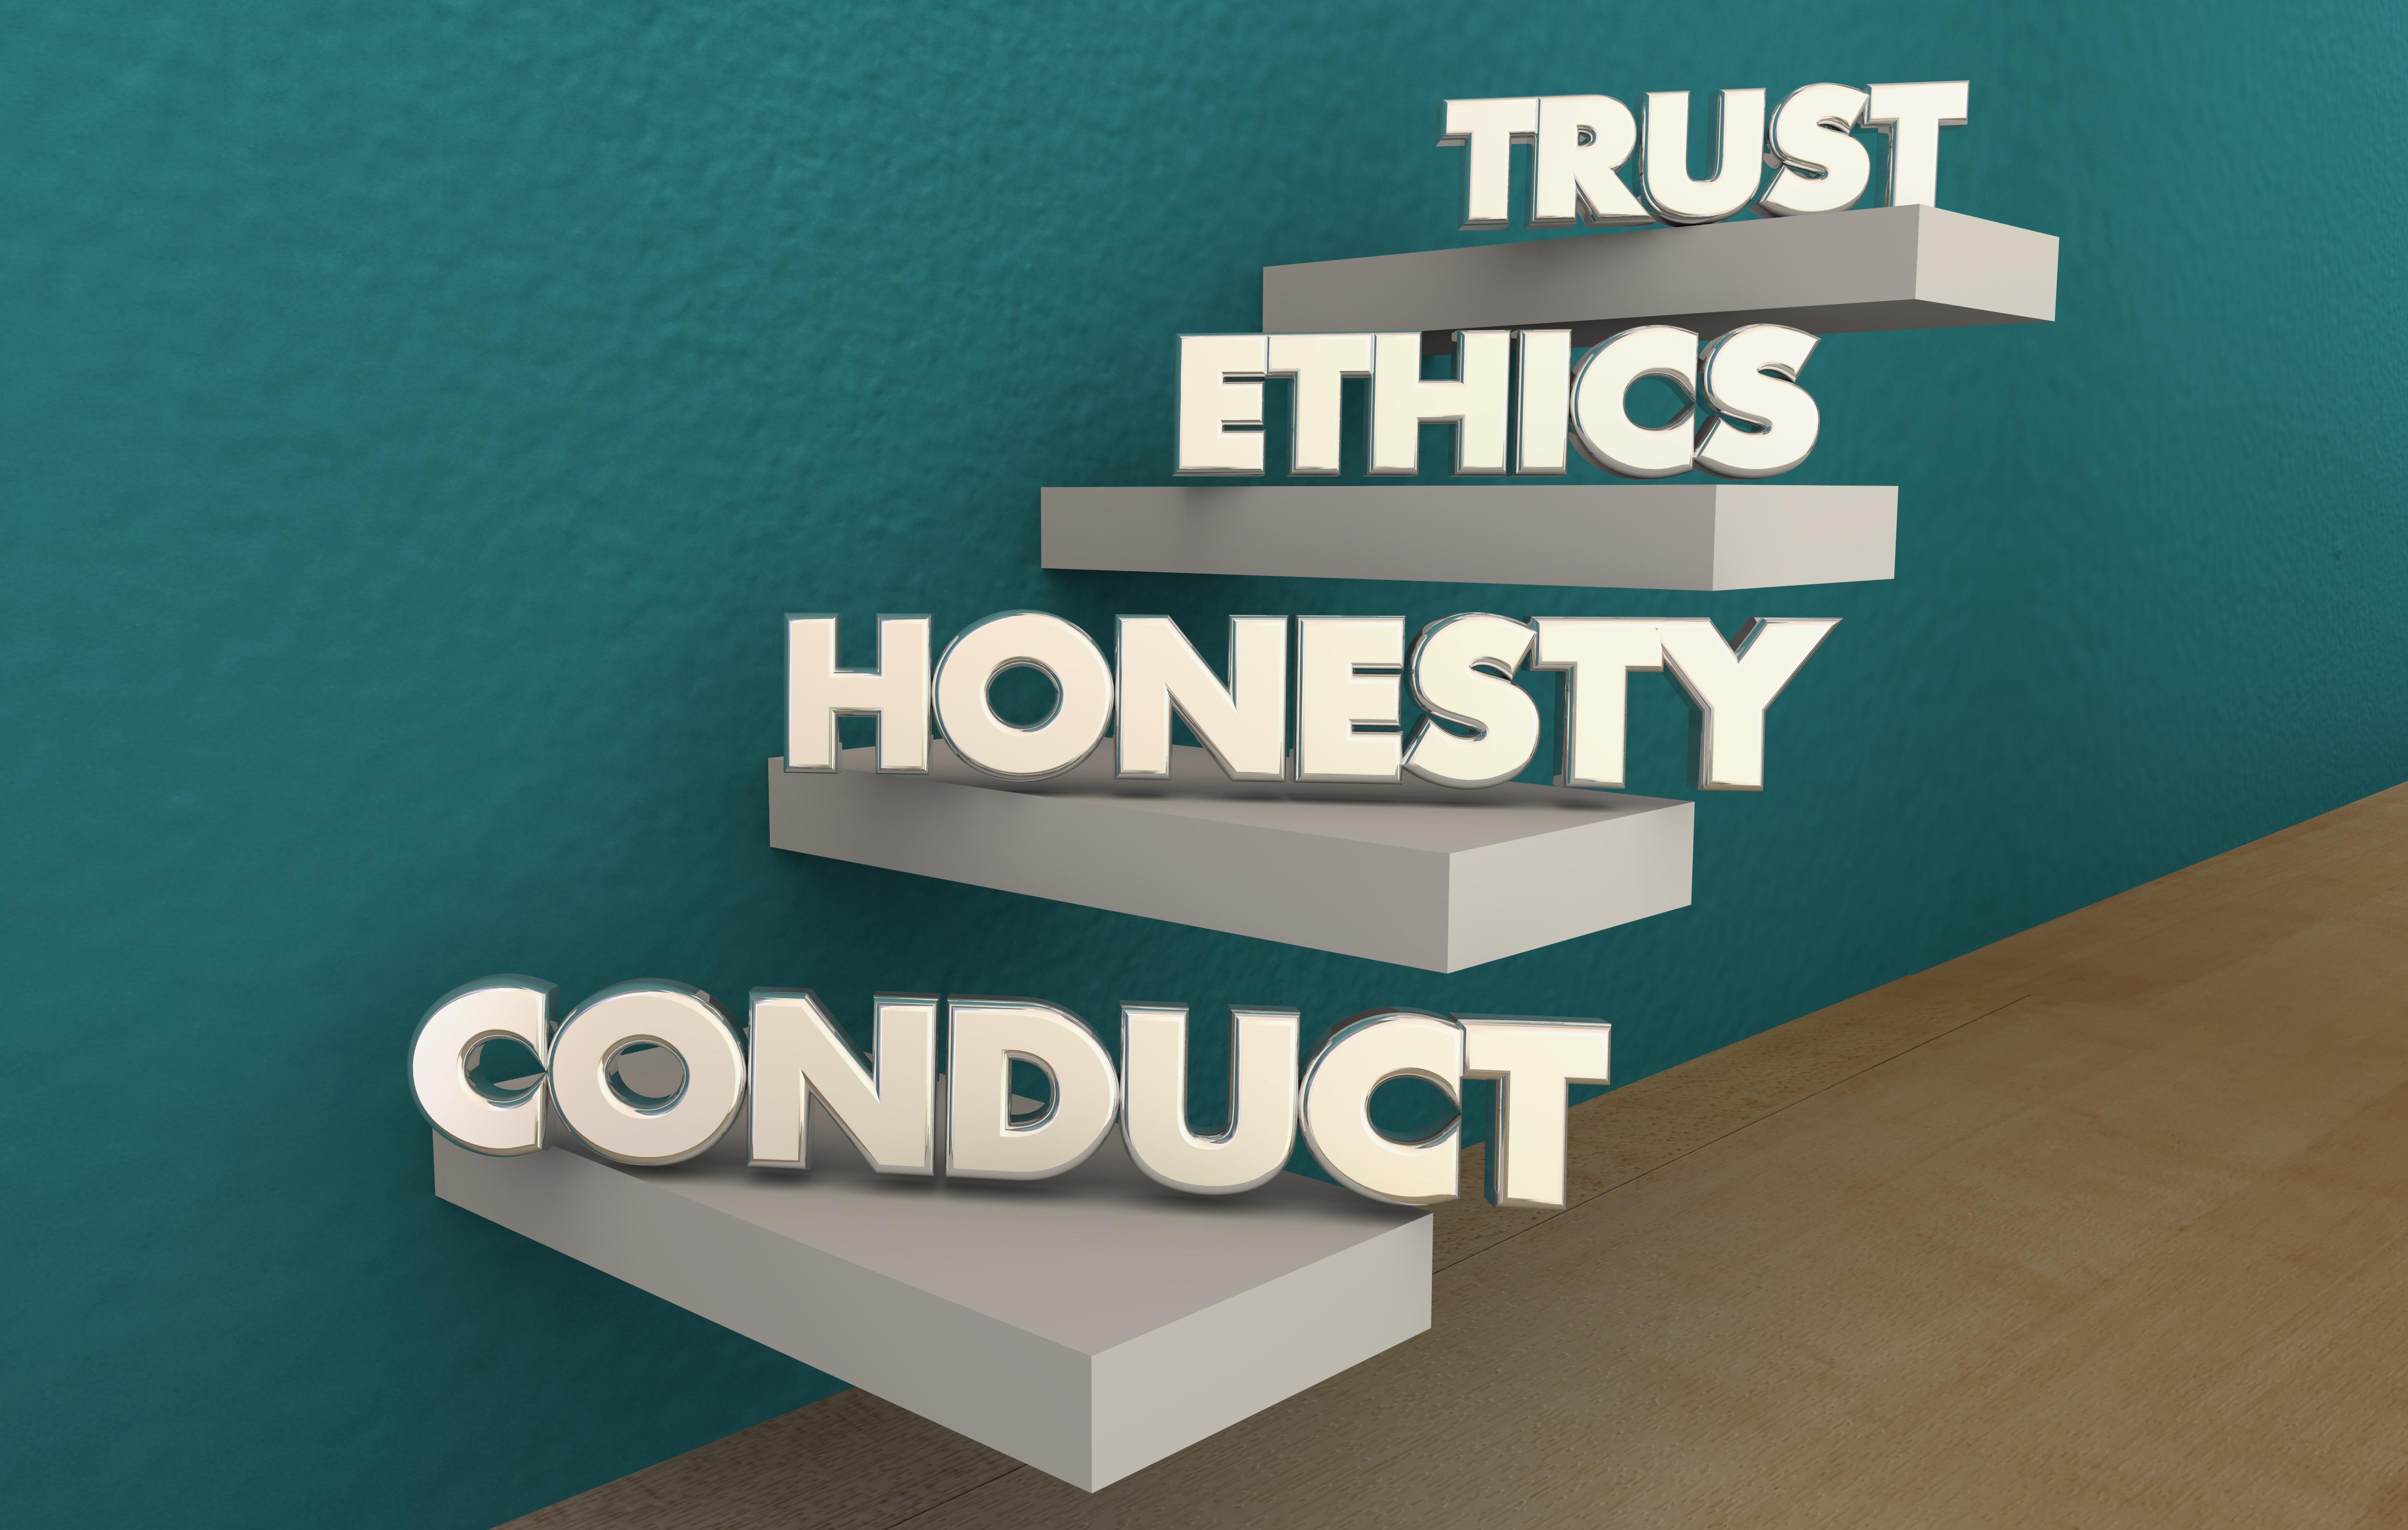 bigstock-Trust-Ethics-Conduct-Honesty-I-213699223.jpg